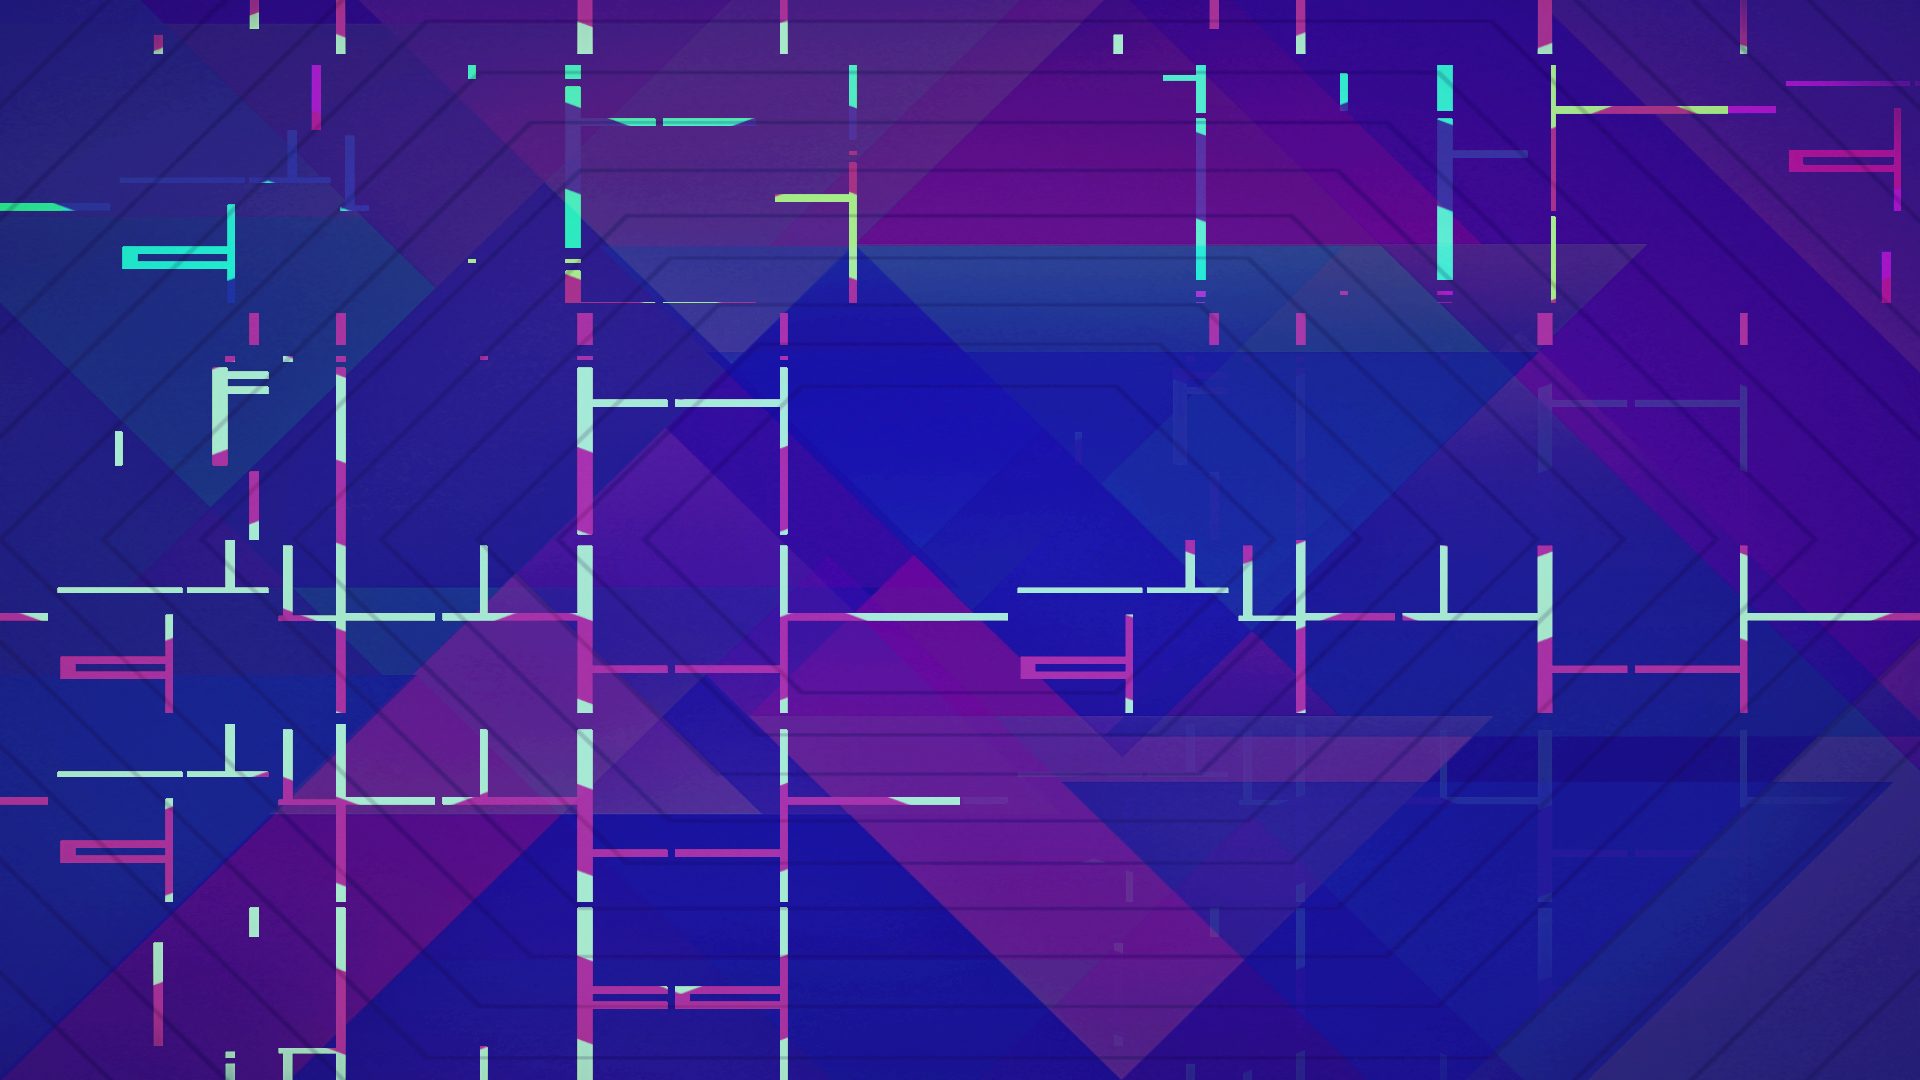 Digital Art Geometry Lines 1920x1080